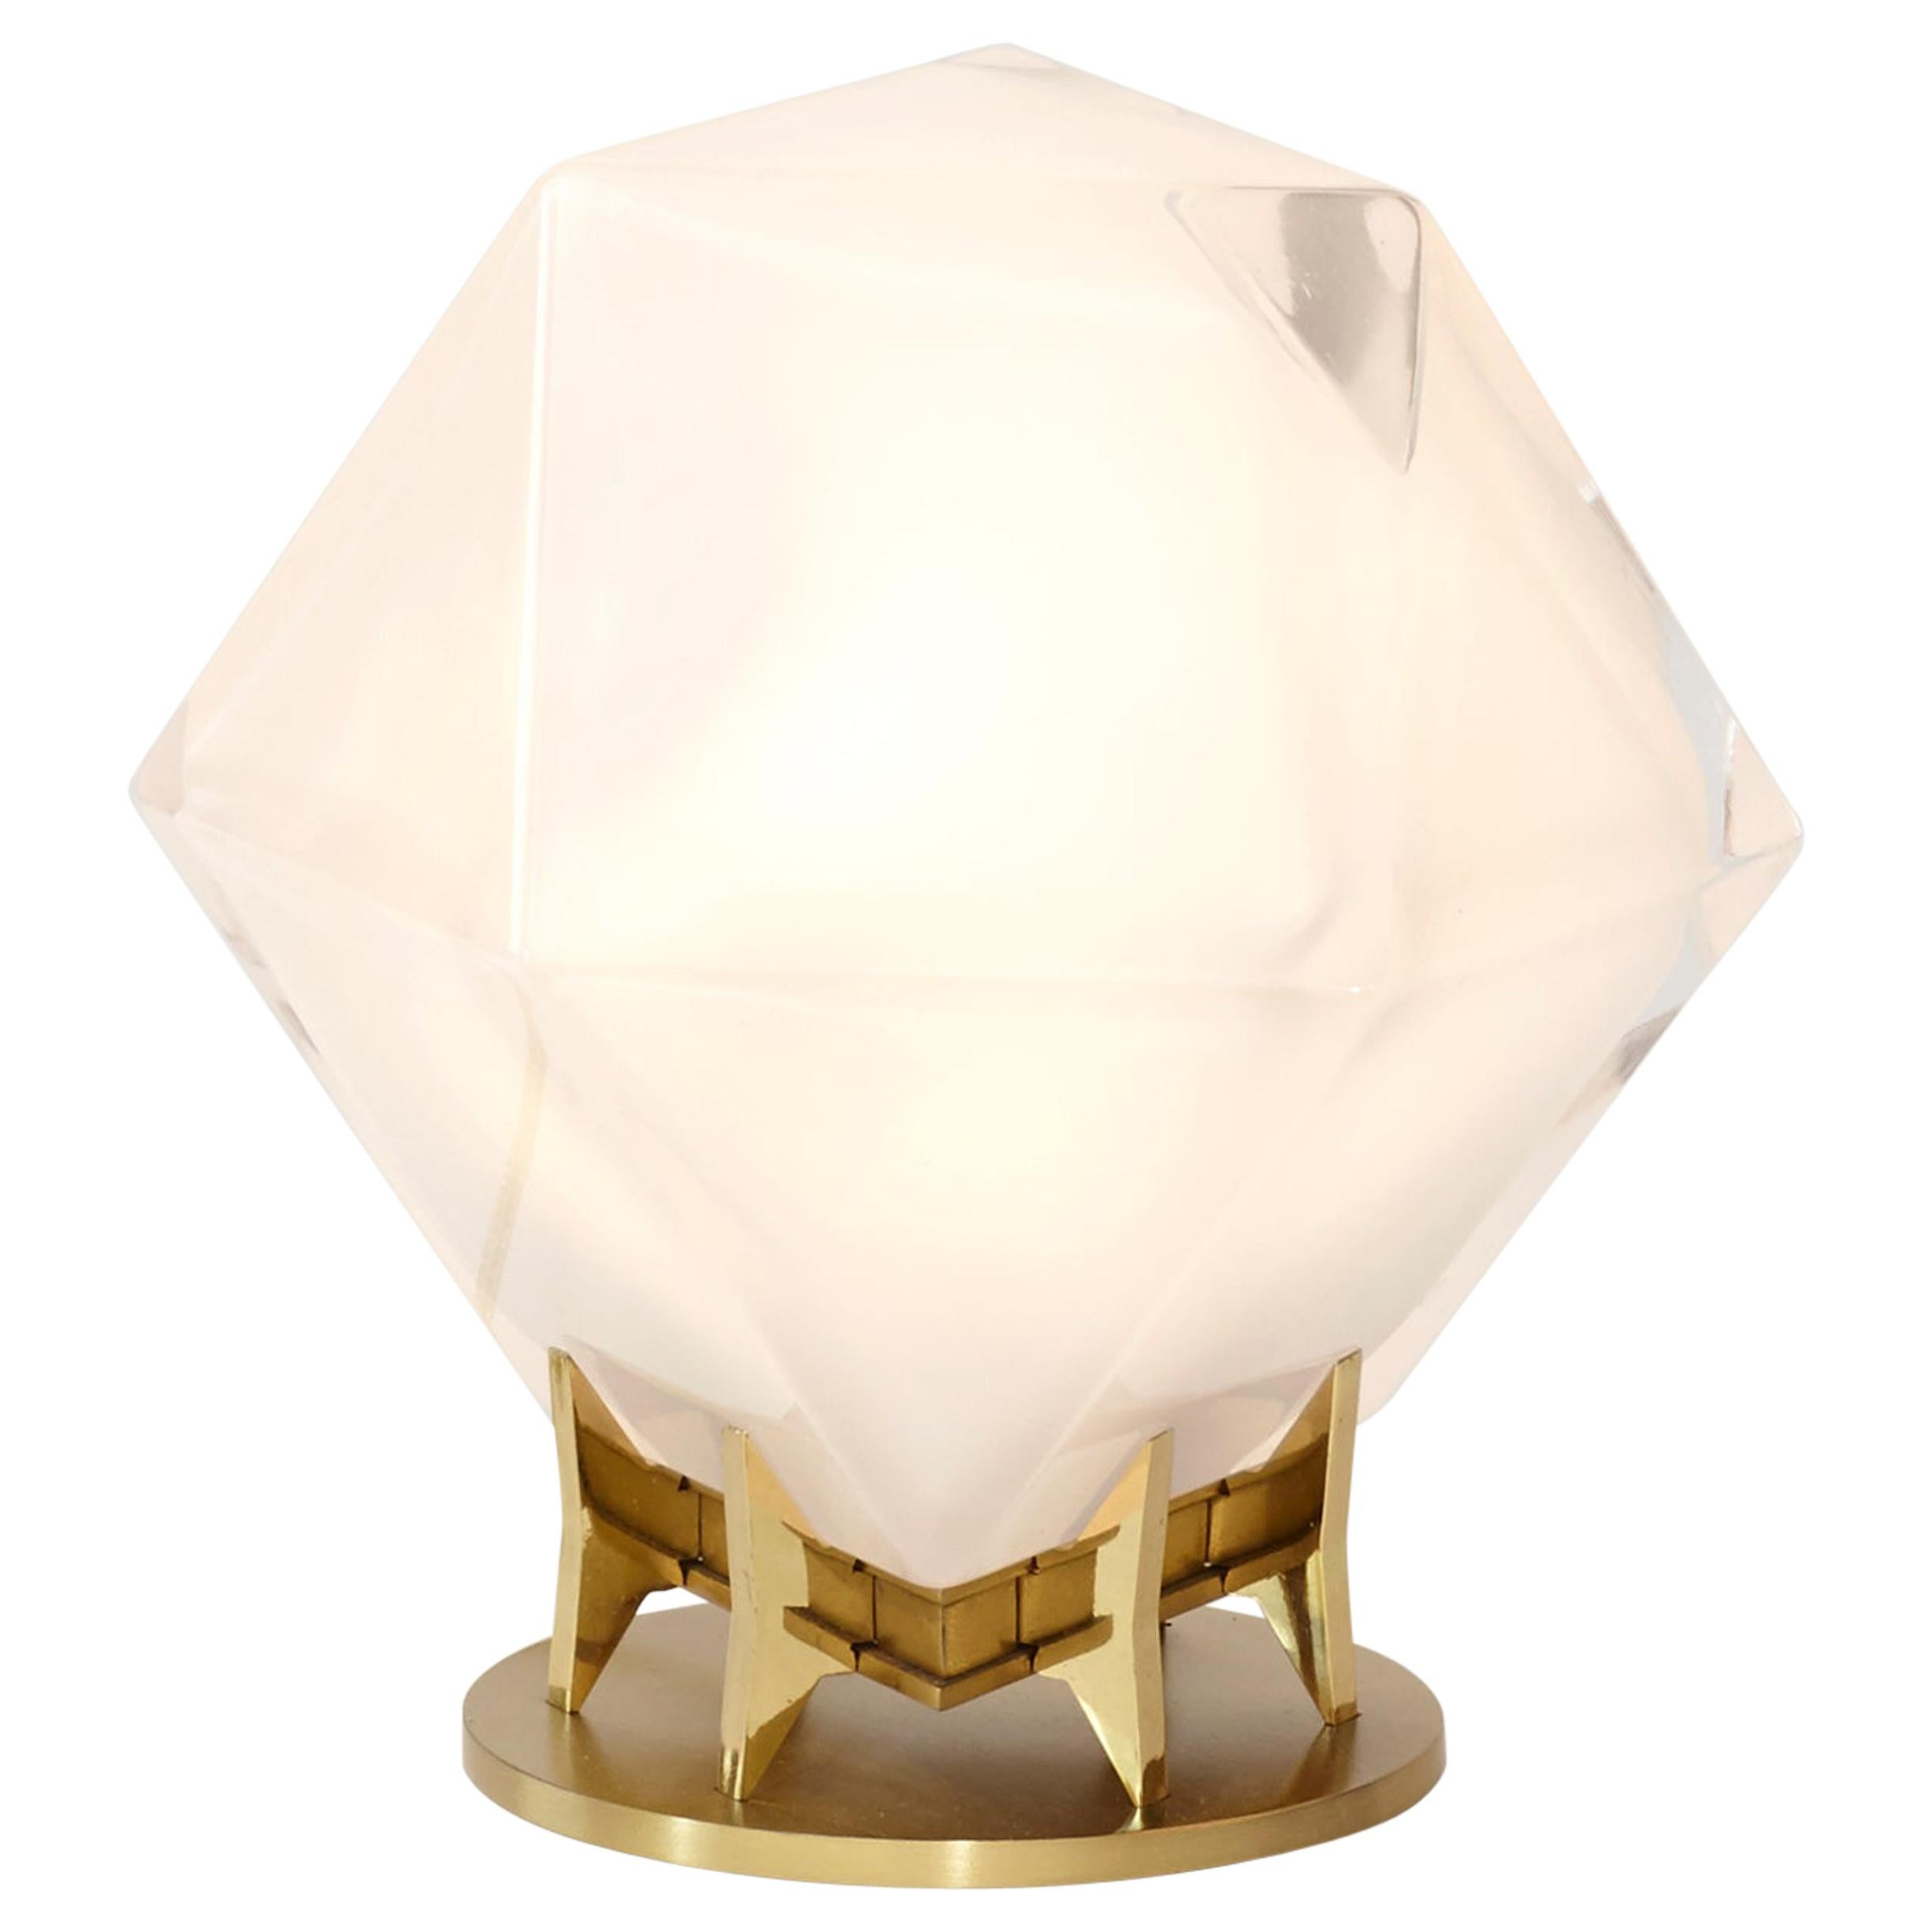 Welles Double Blown Glass Desk Lamp in Alabester White Glass by Gabriel Scott